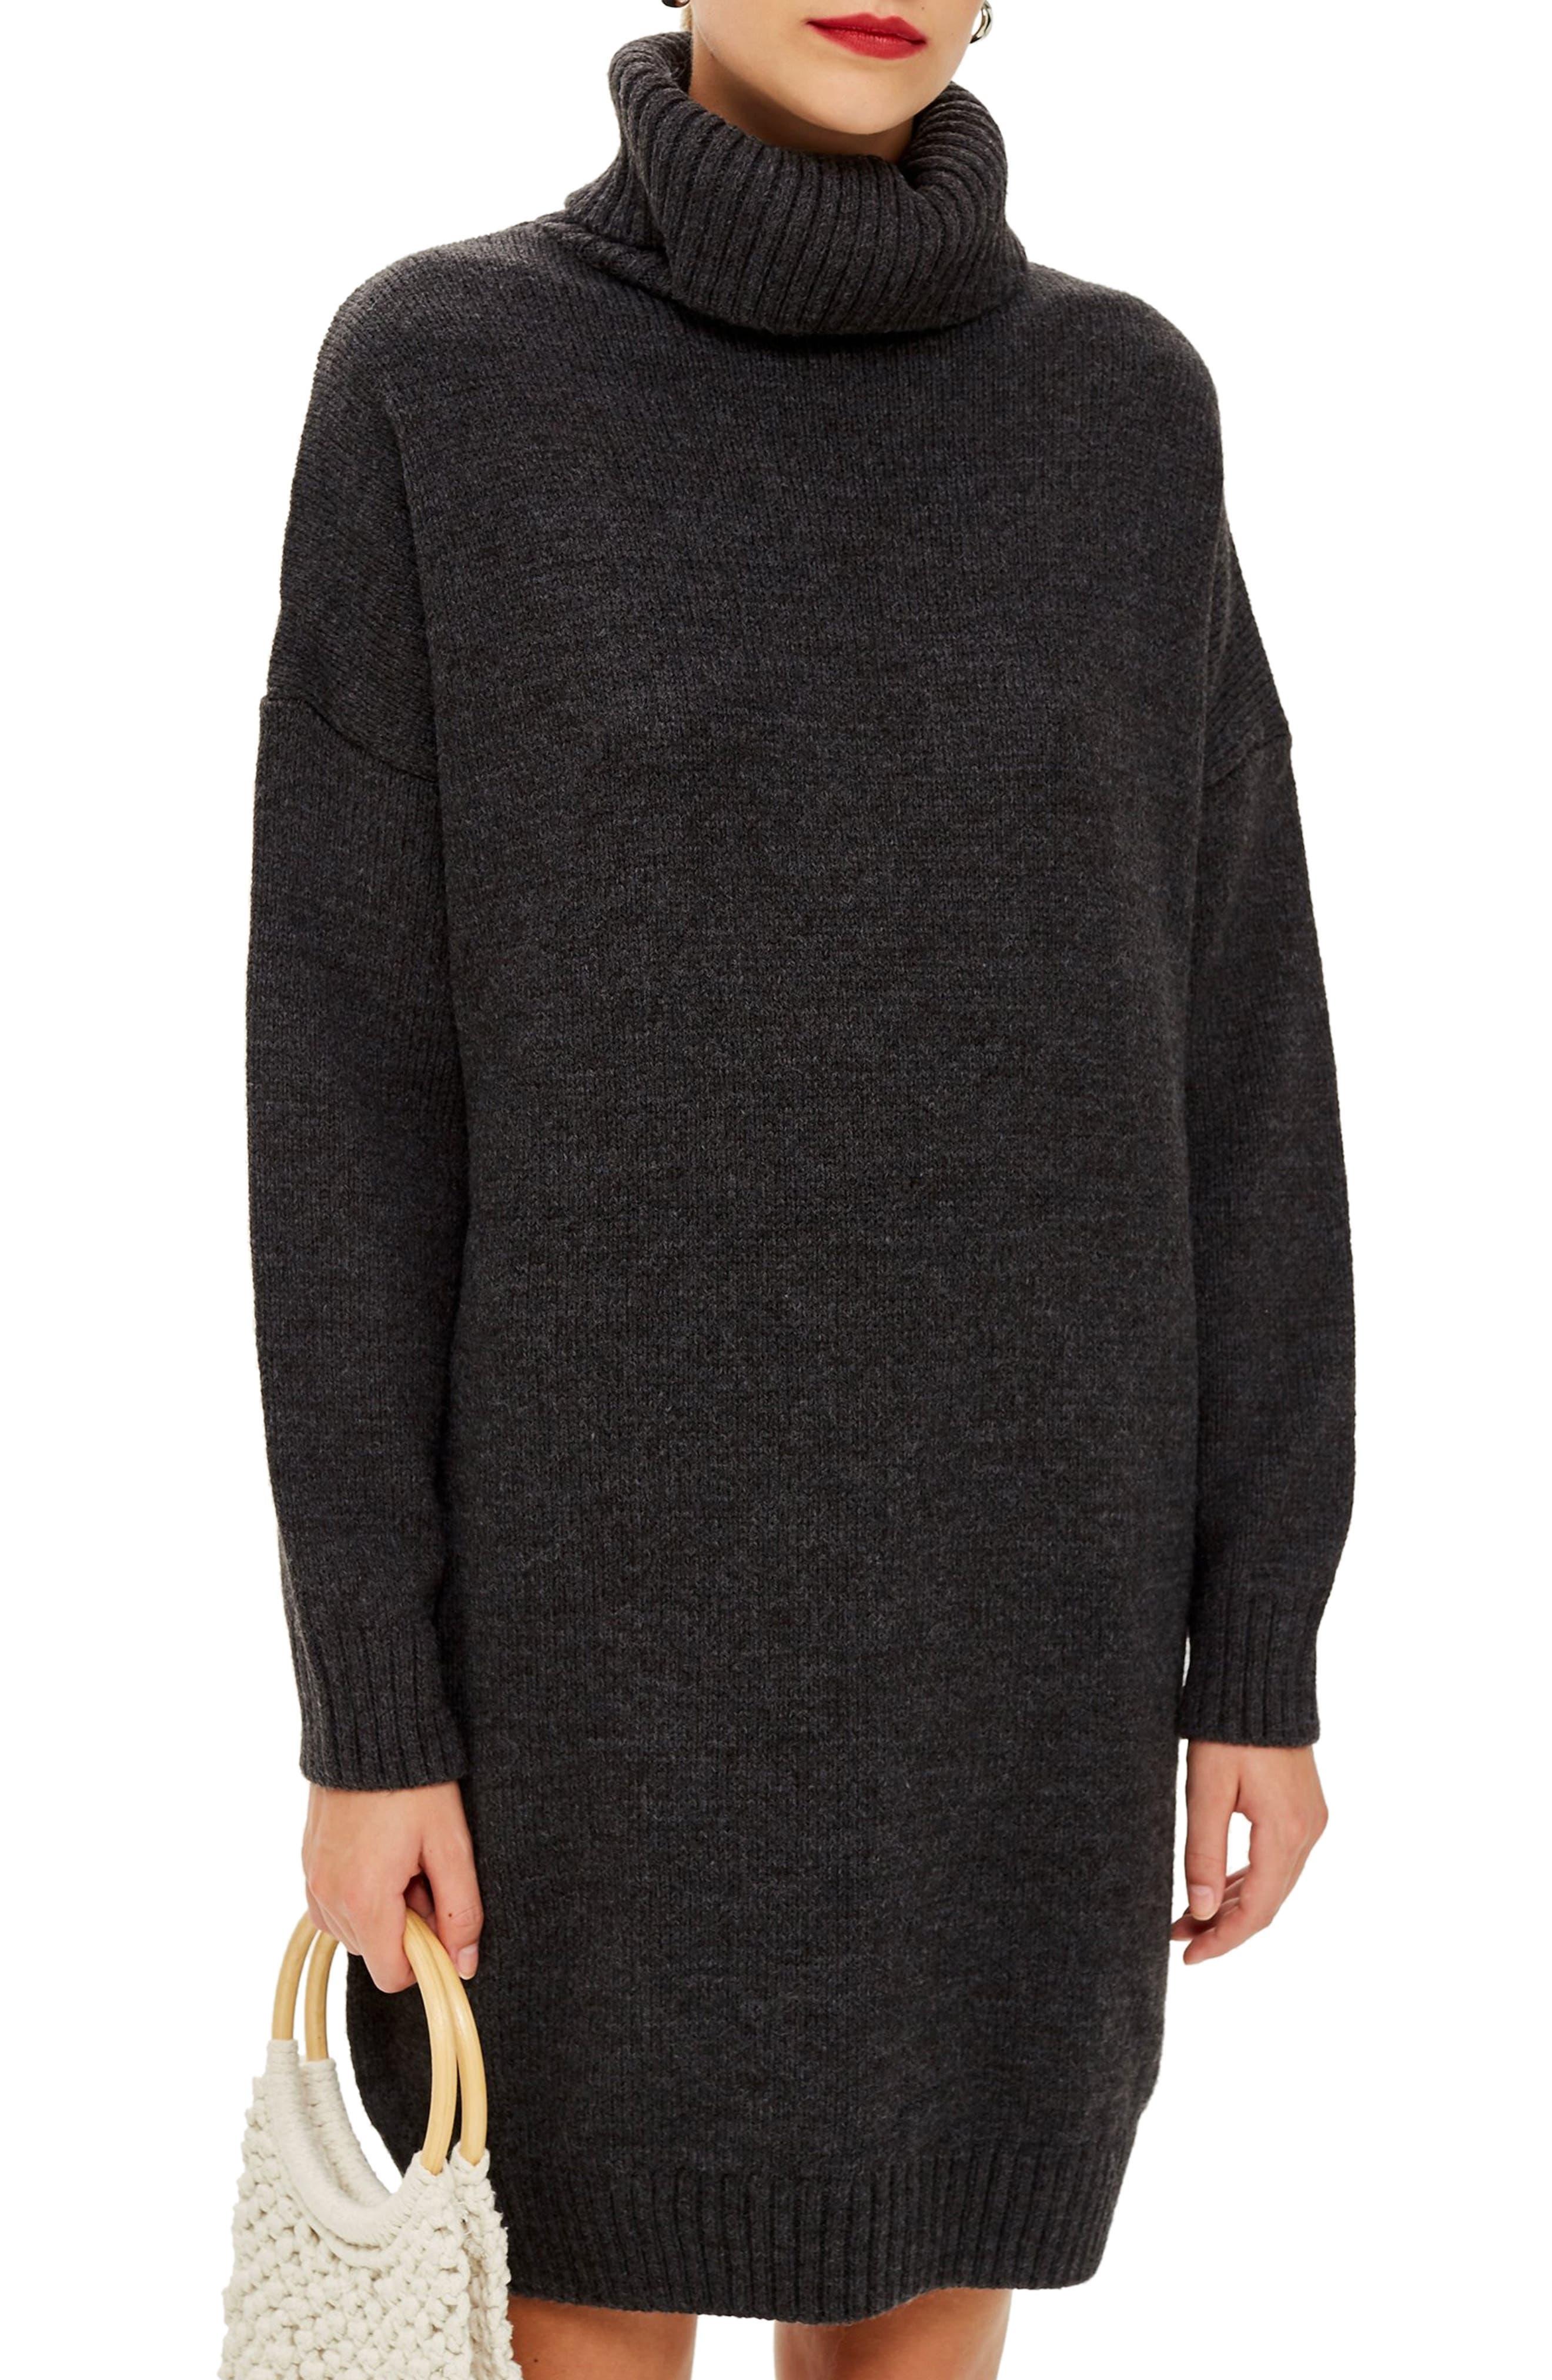 TOPSHOP, Turtleneck Sweater Dress, Main thumbnail 1, color, 021